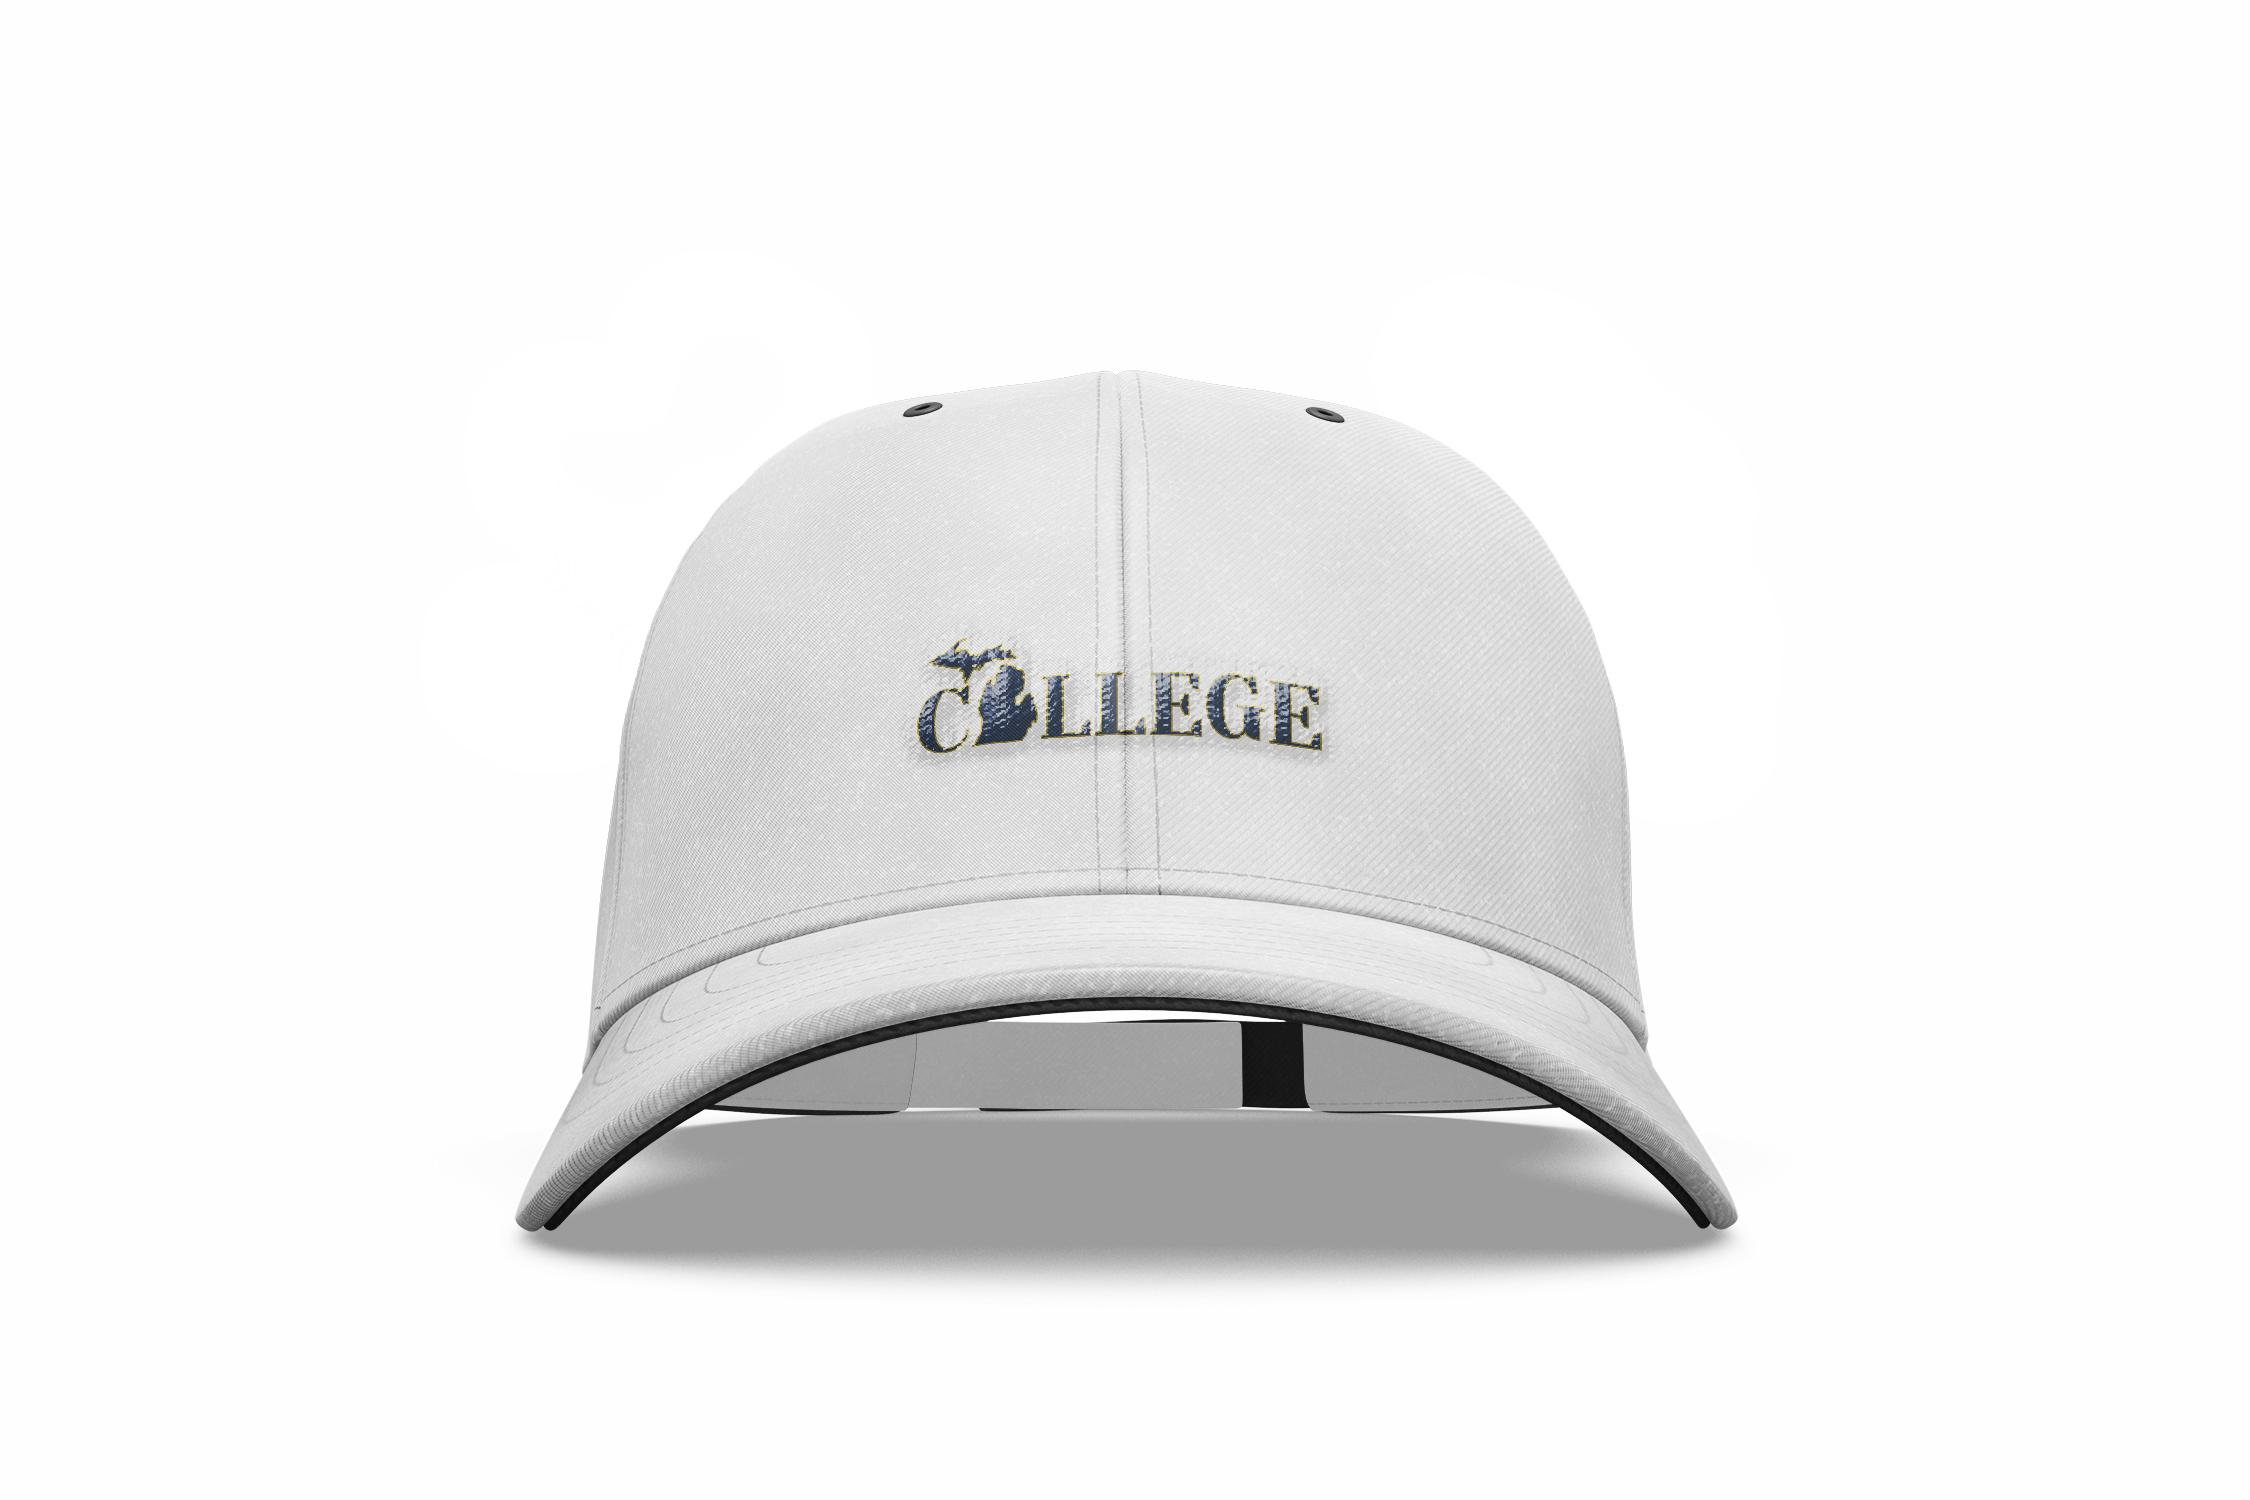 Hat Designs - Photo Mockups - Design 2 Newdesign.jpg